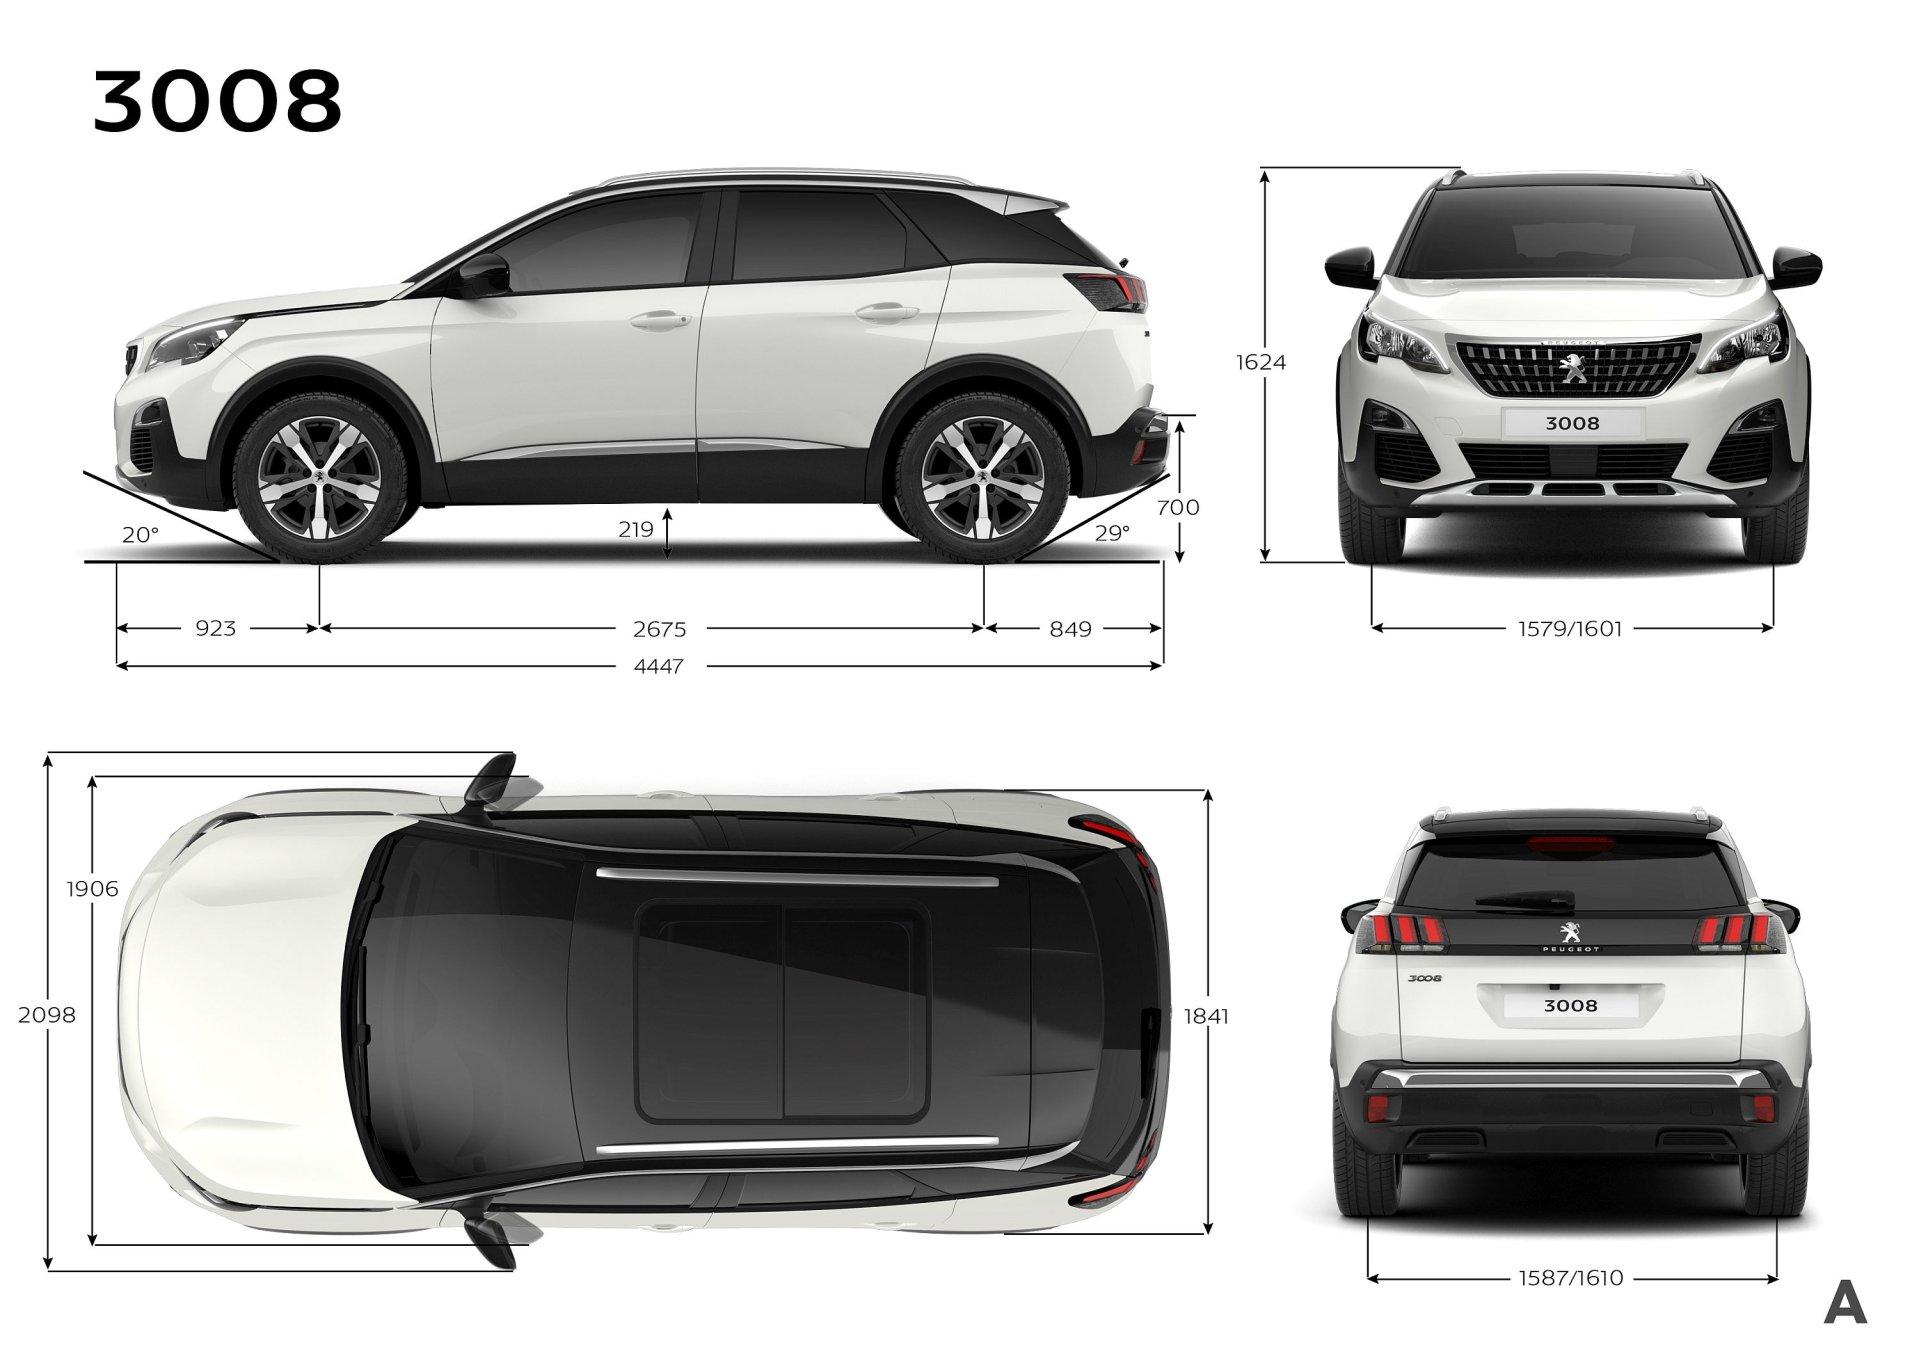 der neue peugeot 3008 suv statt crossover update preise alles auto. Black Bedroom Furniture Sets. Home Design Ideas